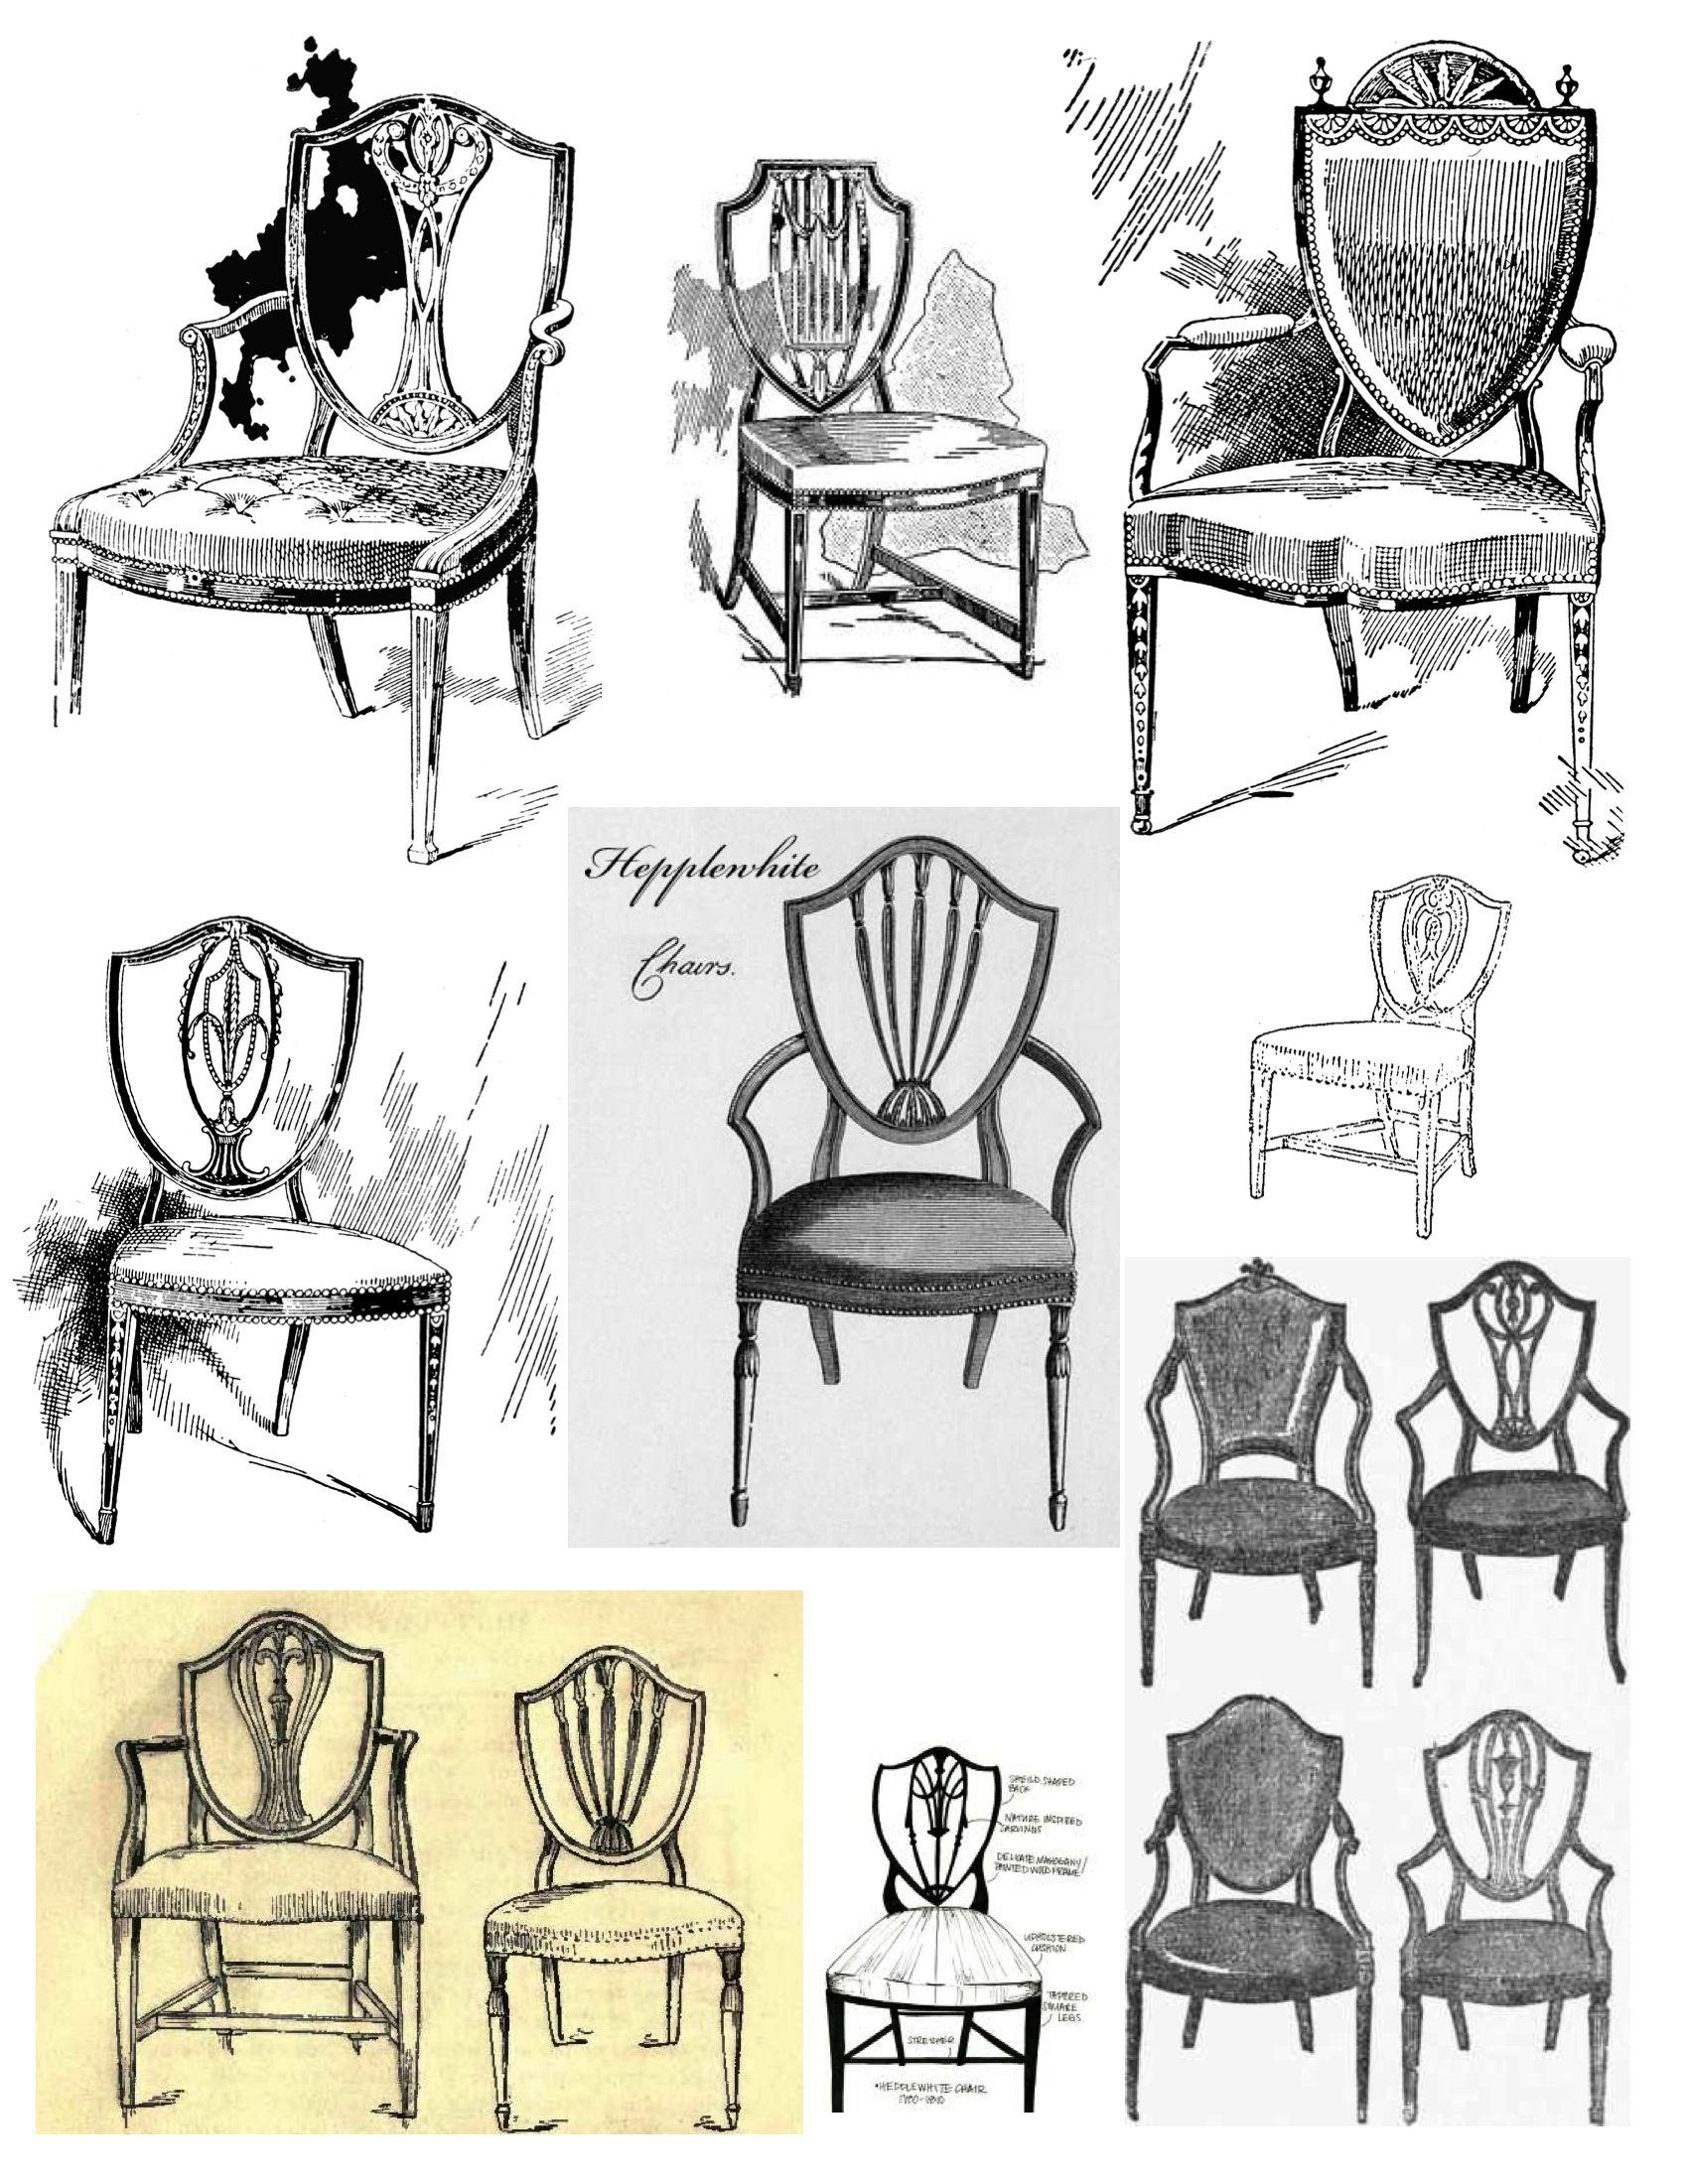 Mystery Of Design The Elegant Hepplewhite Shield Back Chair Classic Furniture Furniture Sketch Furniture Styles